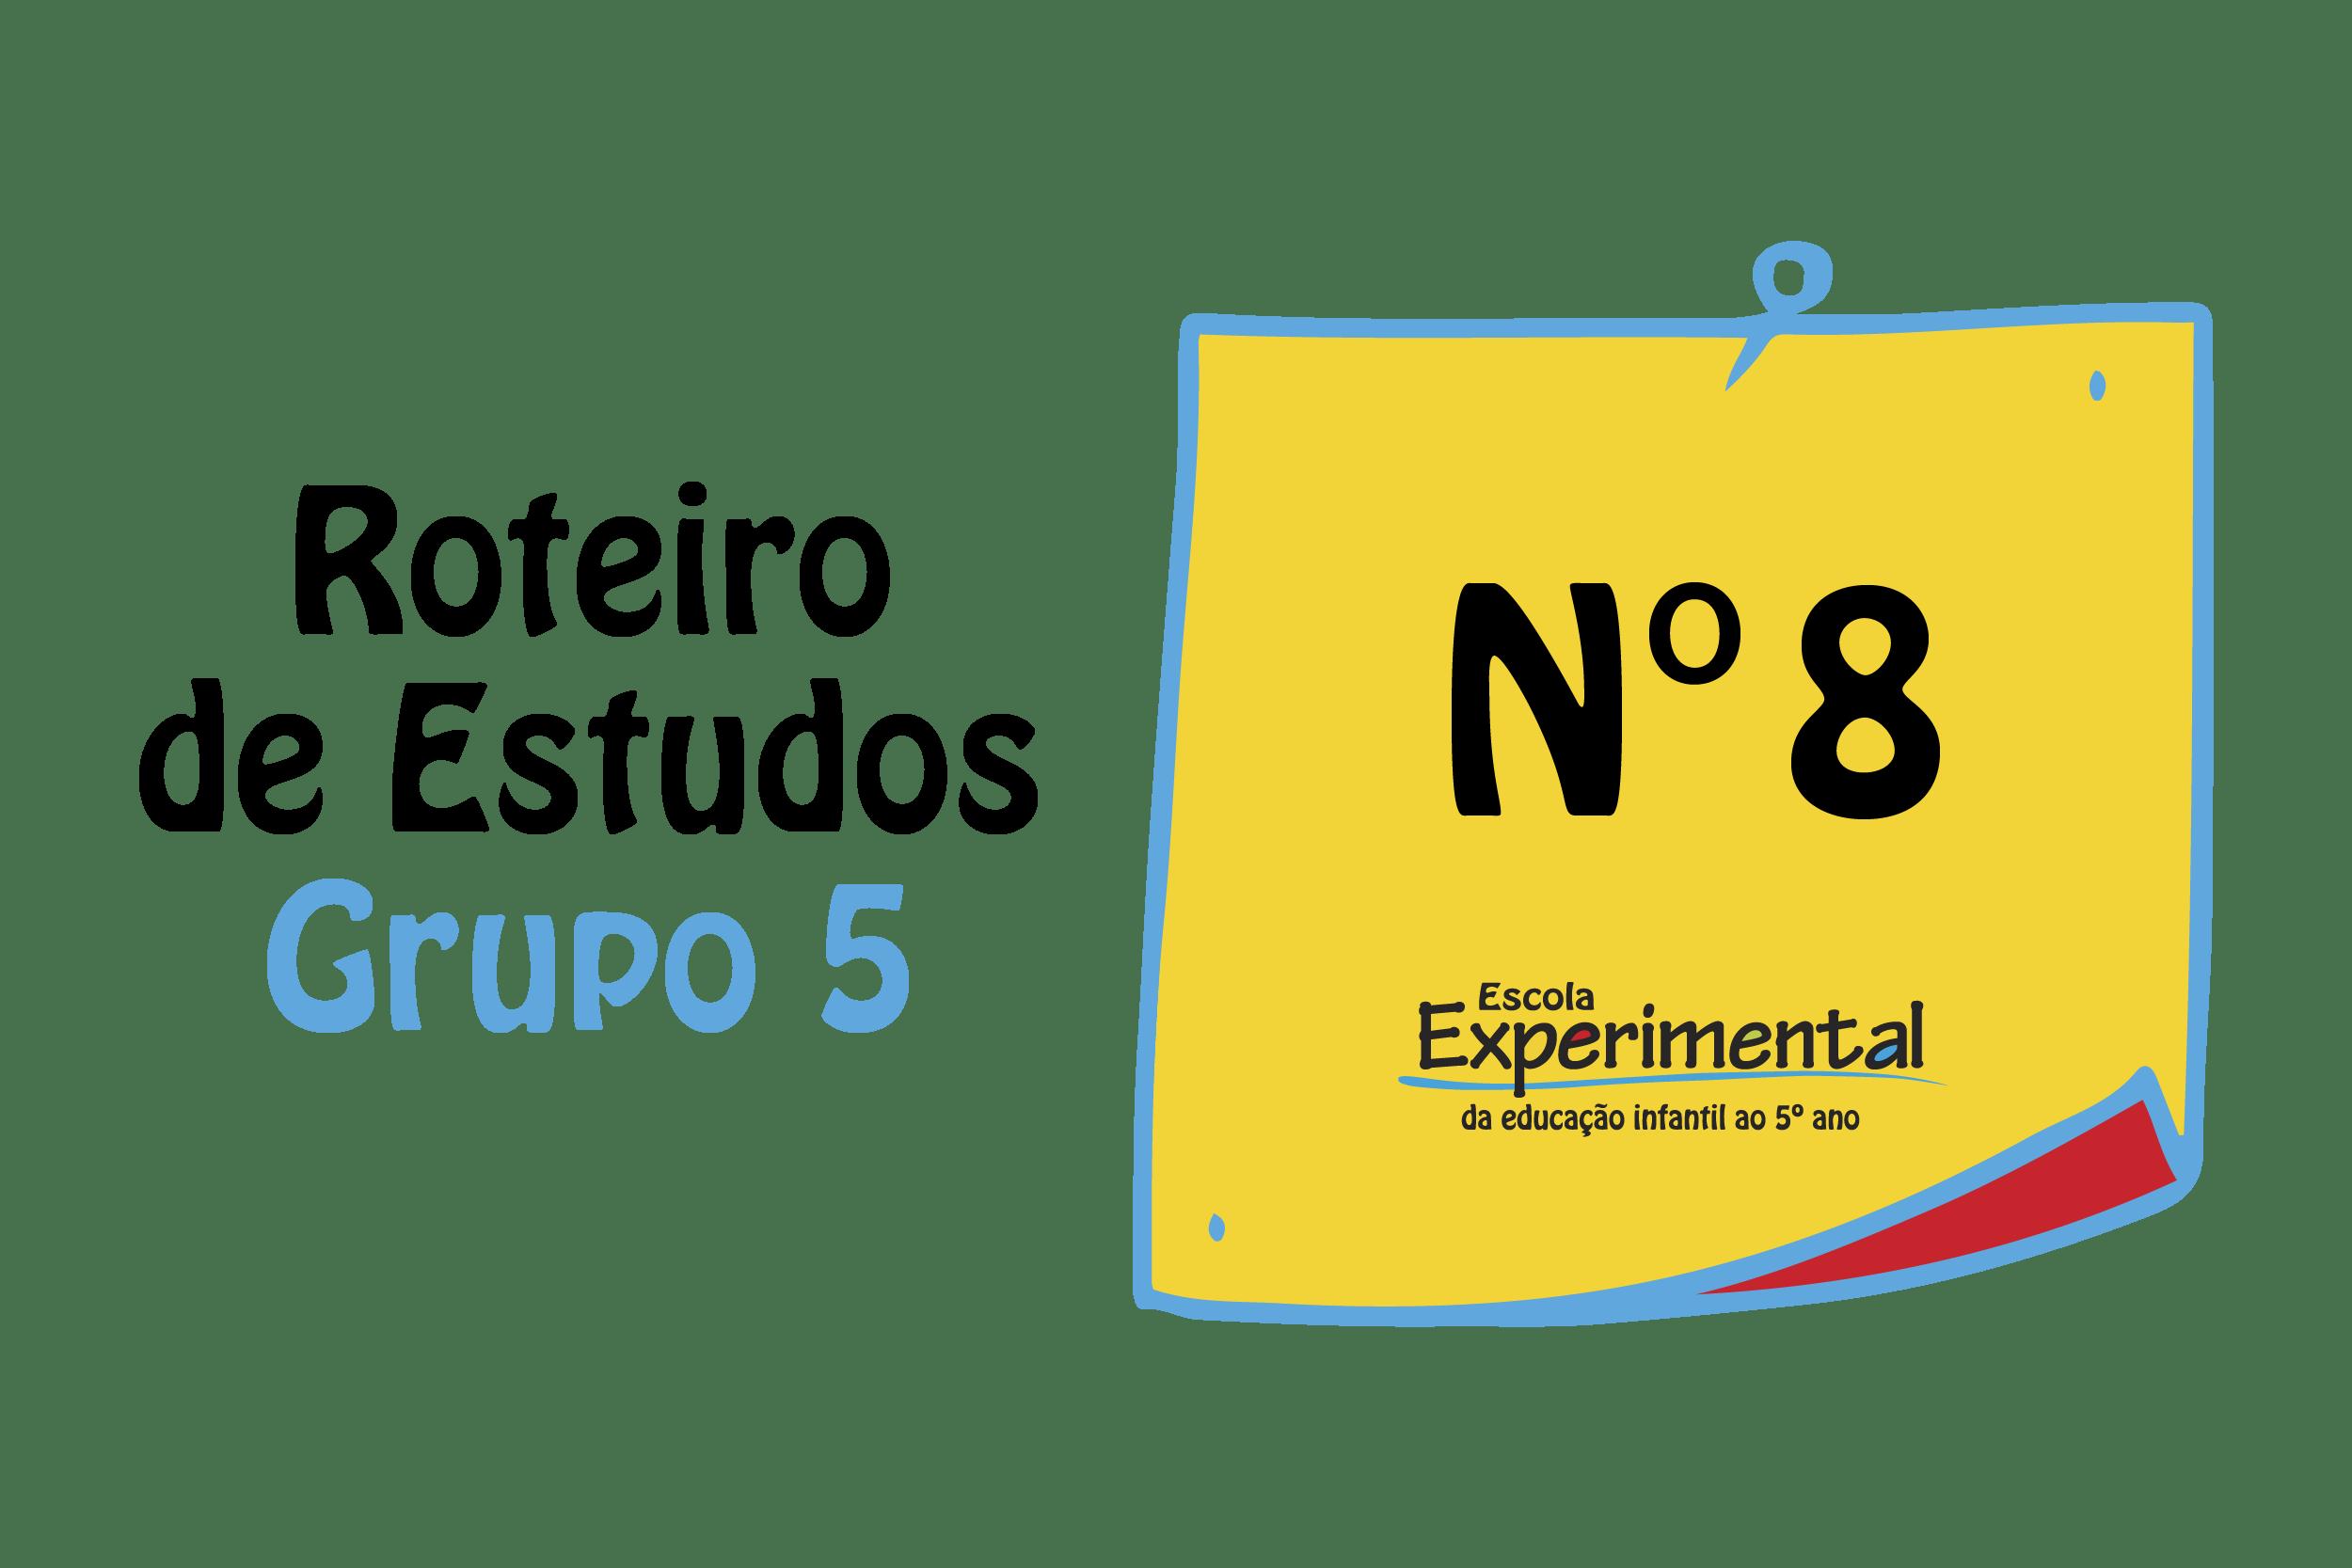 GRUPO 5 – Roteiro de Estudos (15/06 a 19/06)